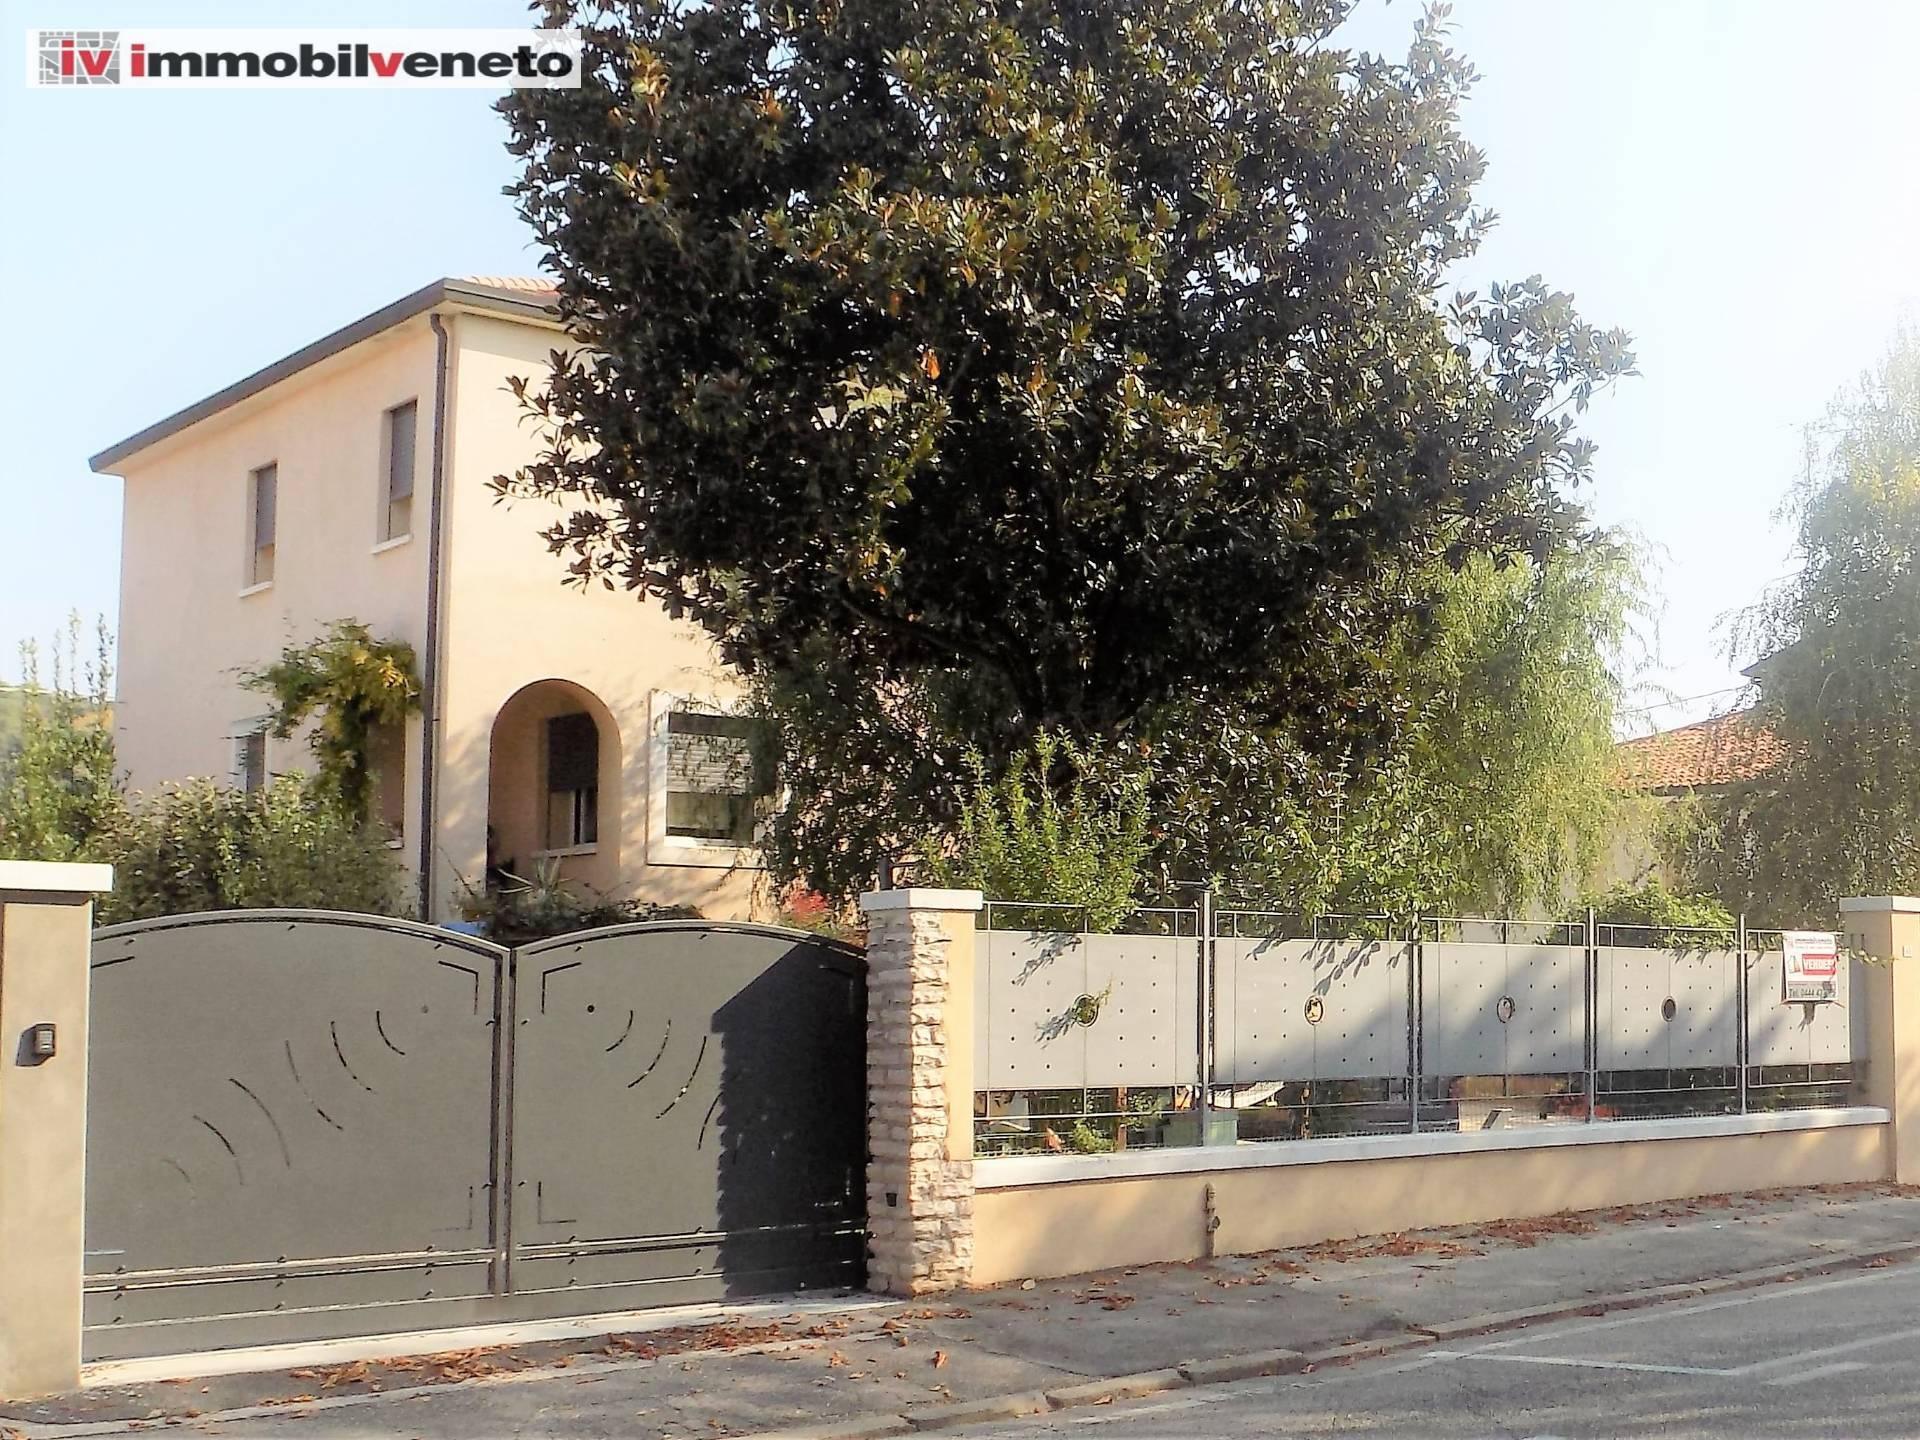 Soluzione Indipendente in vendita a Lonigo, 10 locali, Trattative riservate | CambioCasa.it